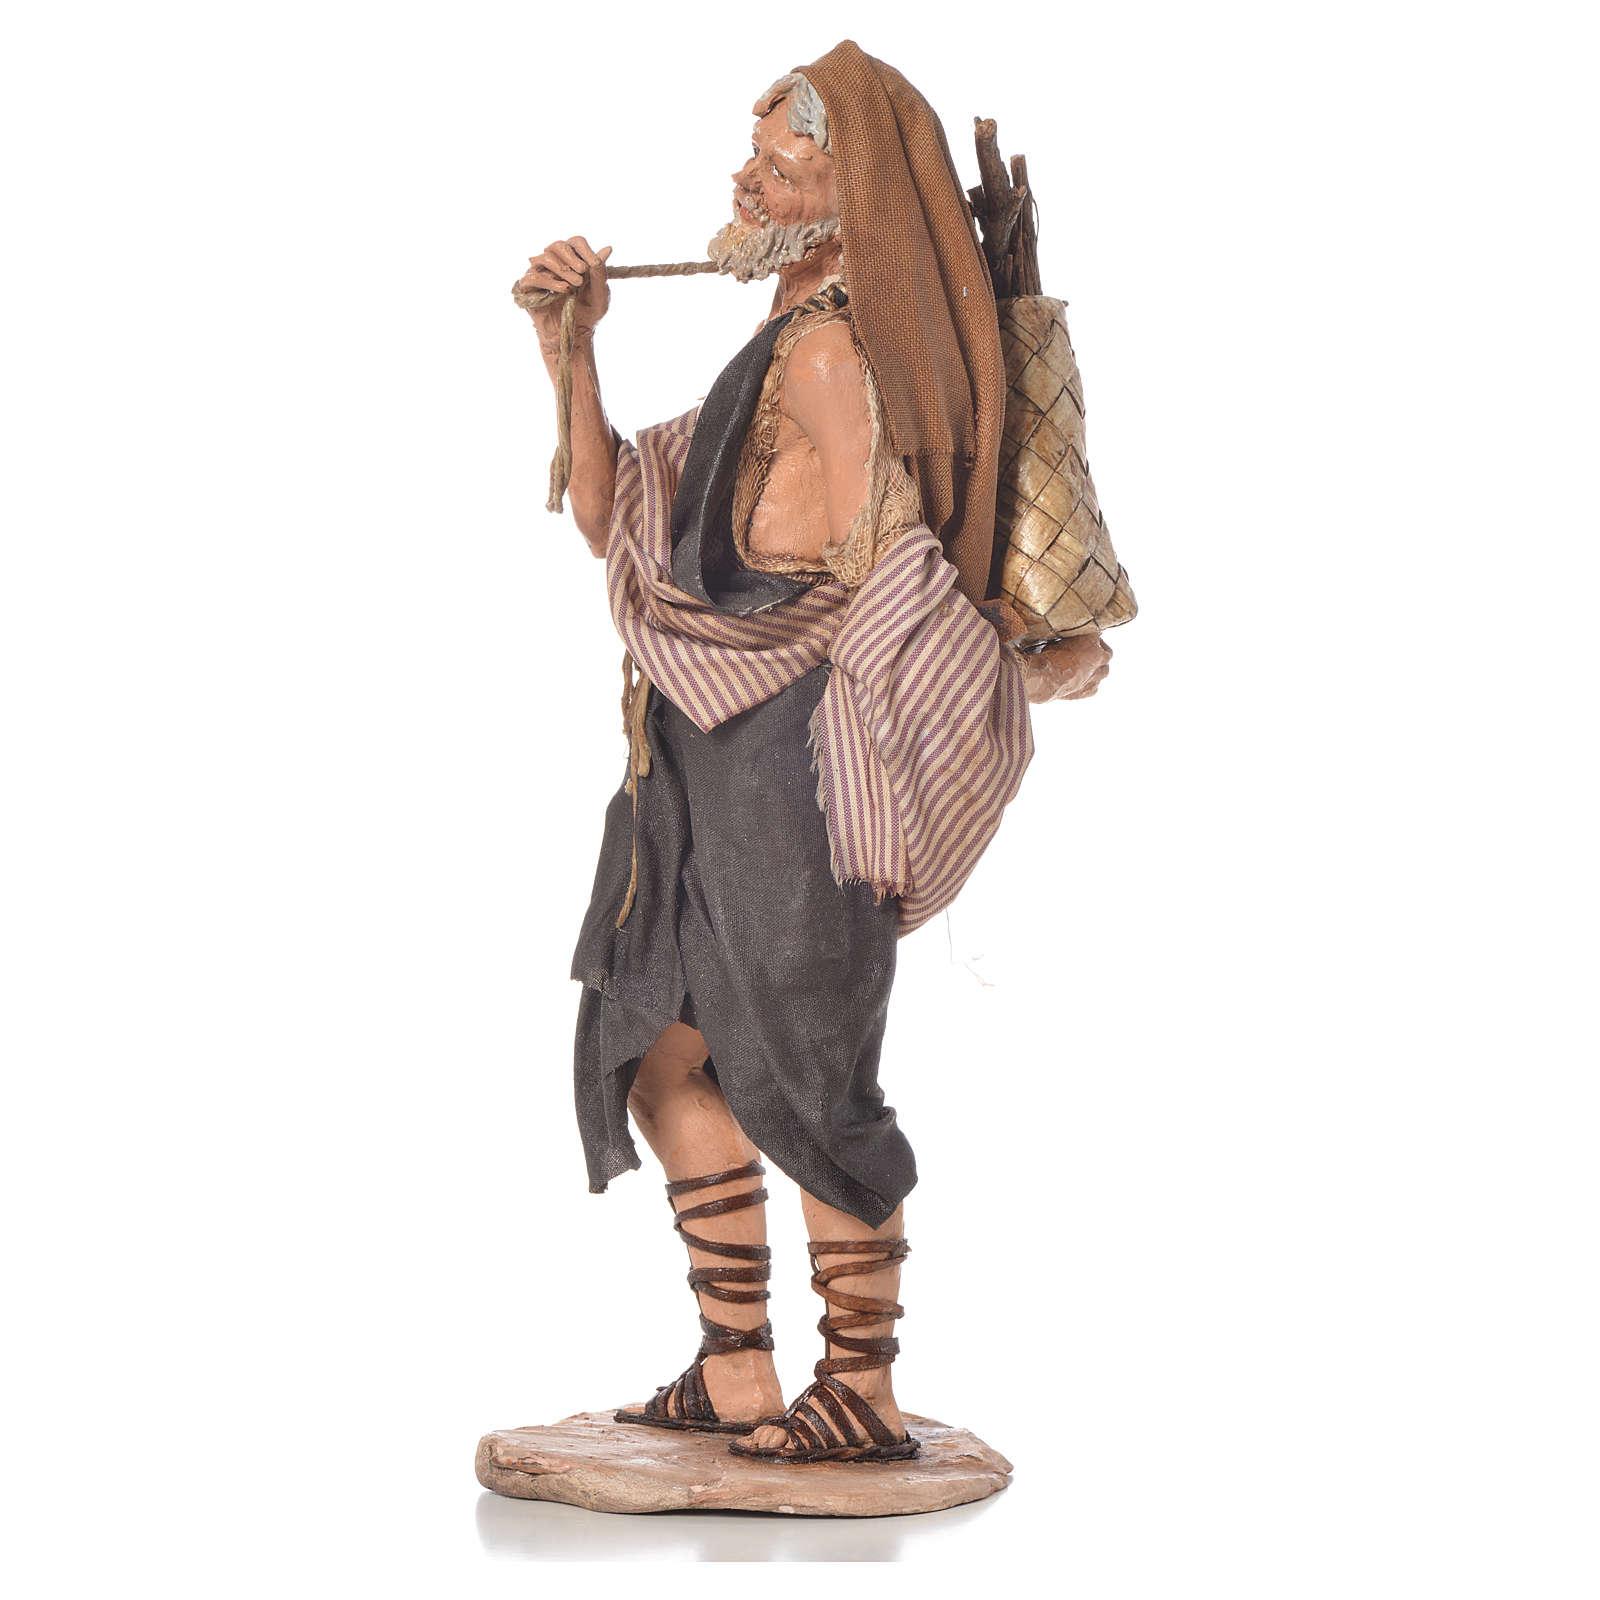 Boscaiolo 18 cm presepe Angela Tripi 4